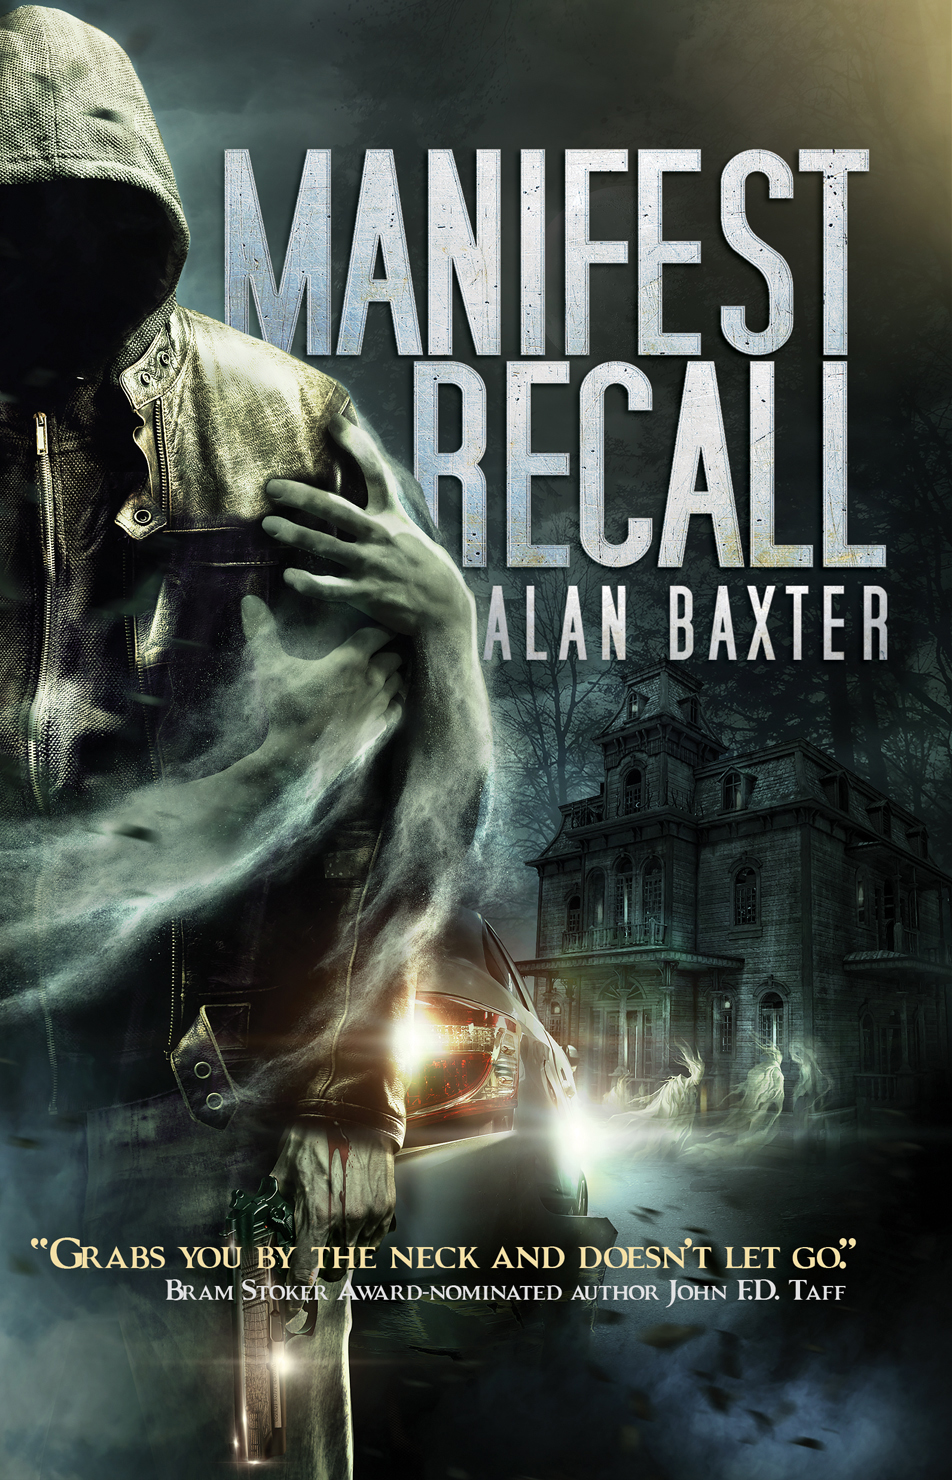 Manifest-Recall_Alan Baxter.jpg